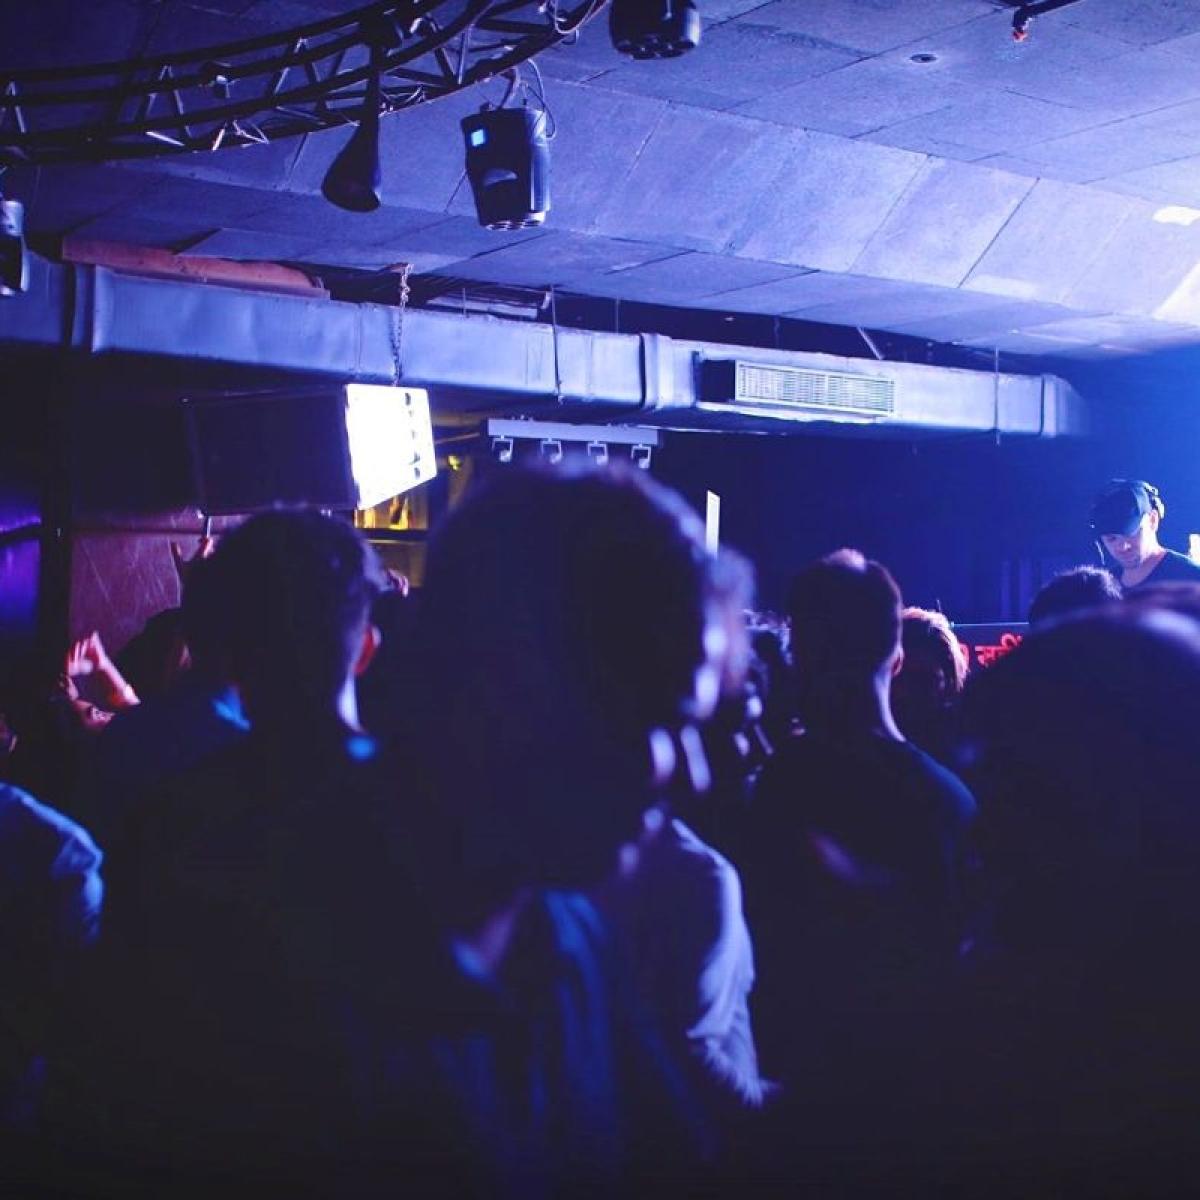 Verve missing as Mumbai nightlife policy kicks in; Huge response wasn't expected, says Aaditya Thackeray